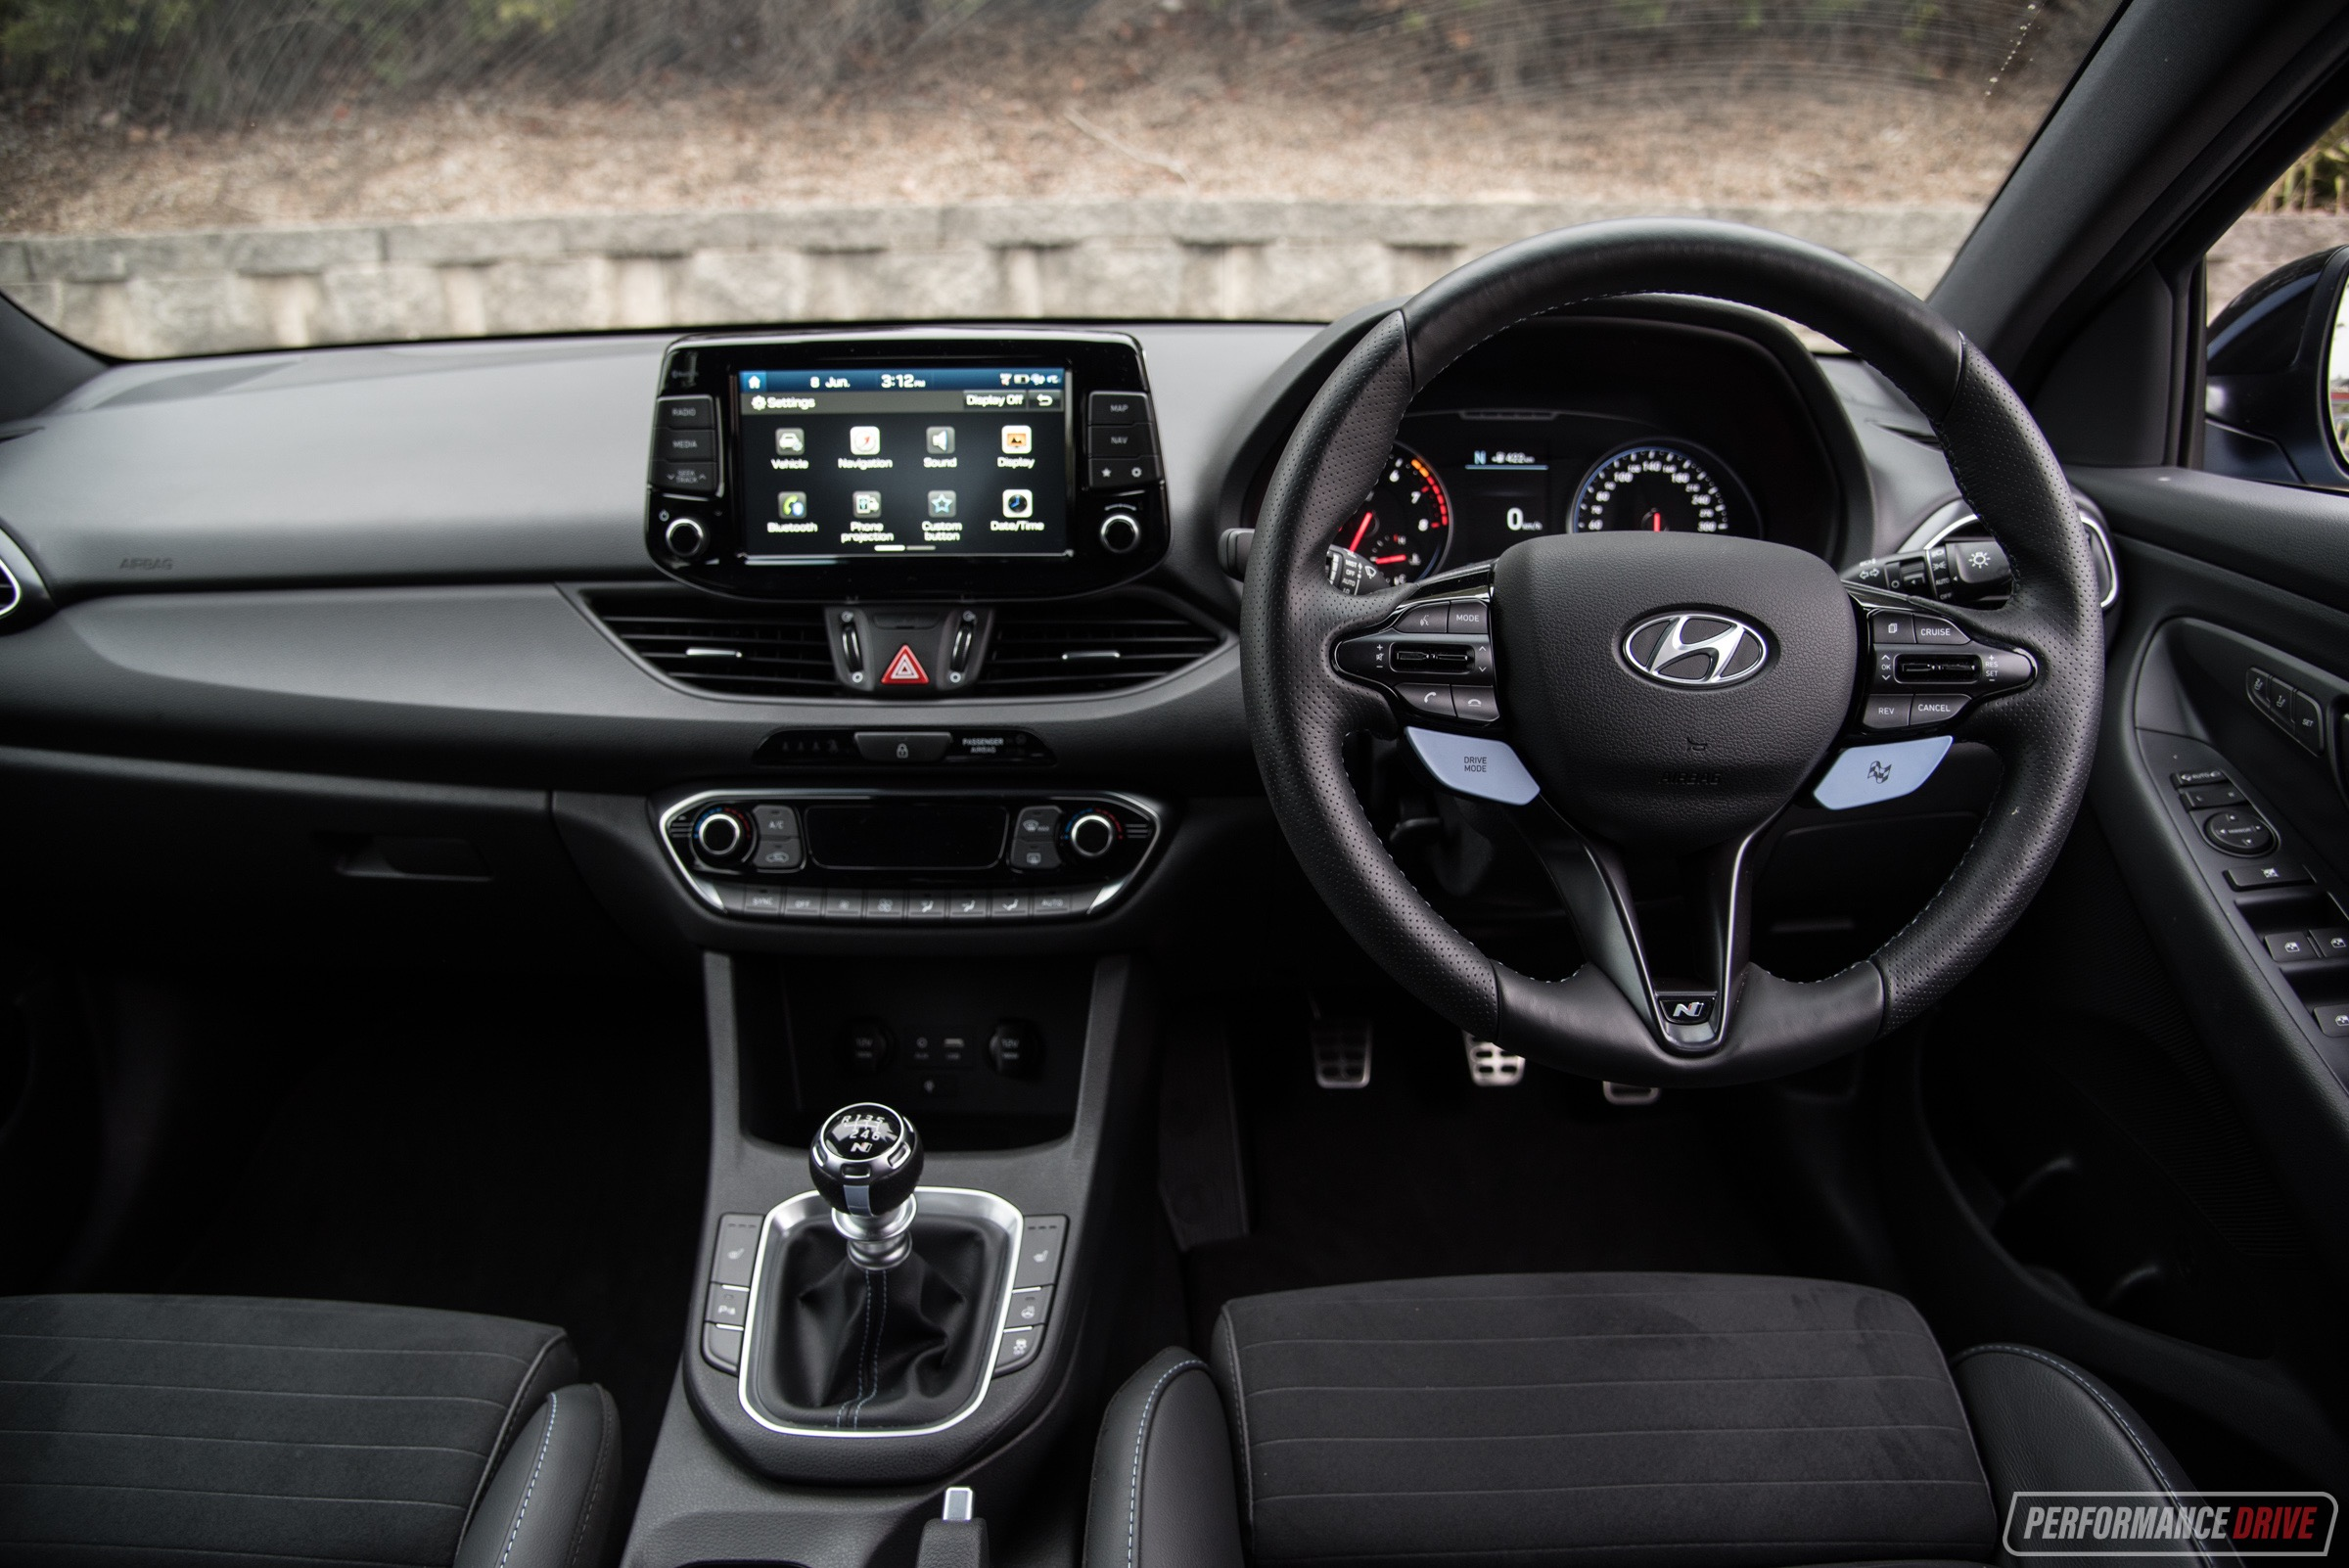 Hyundai I N Interior on Hyundai Veloster